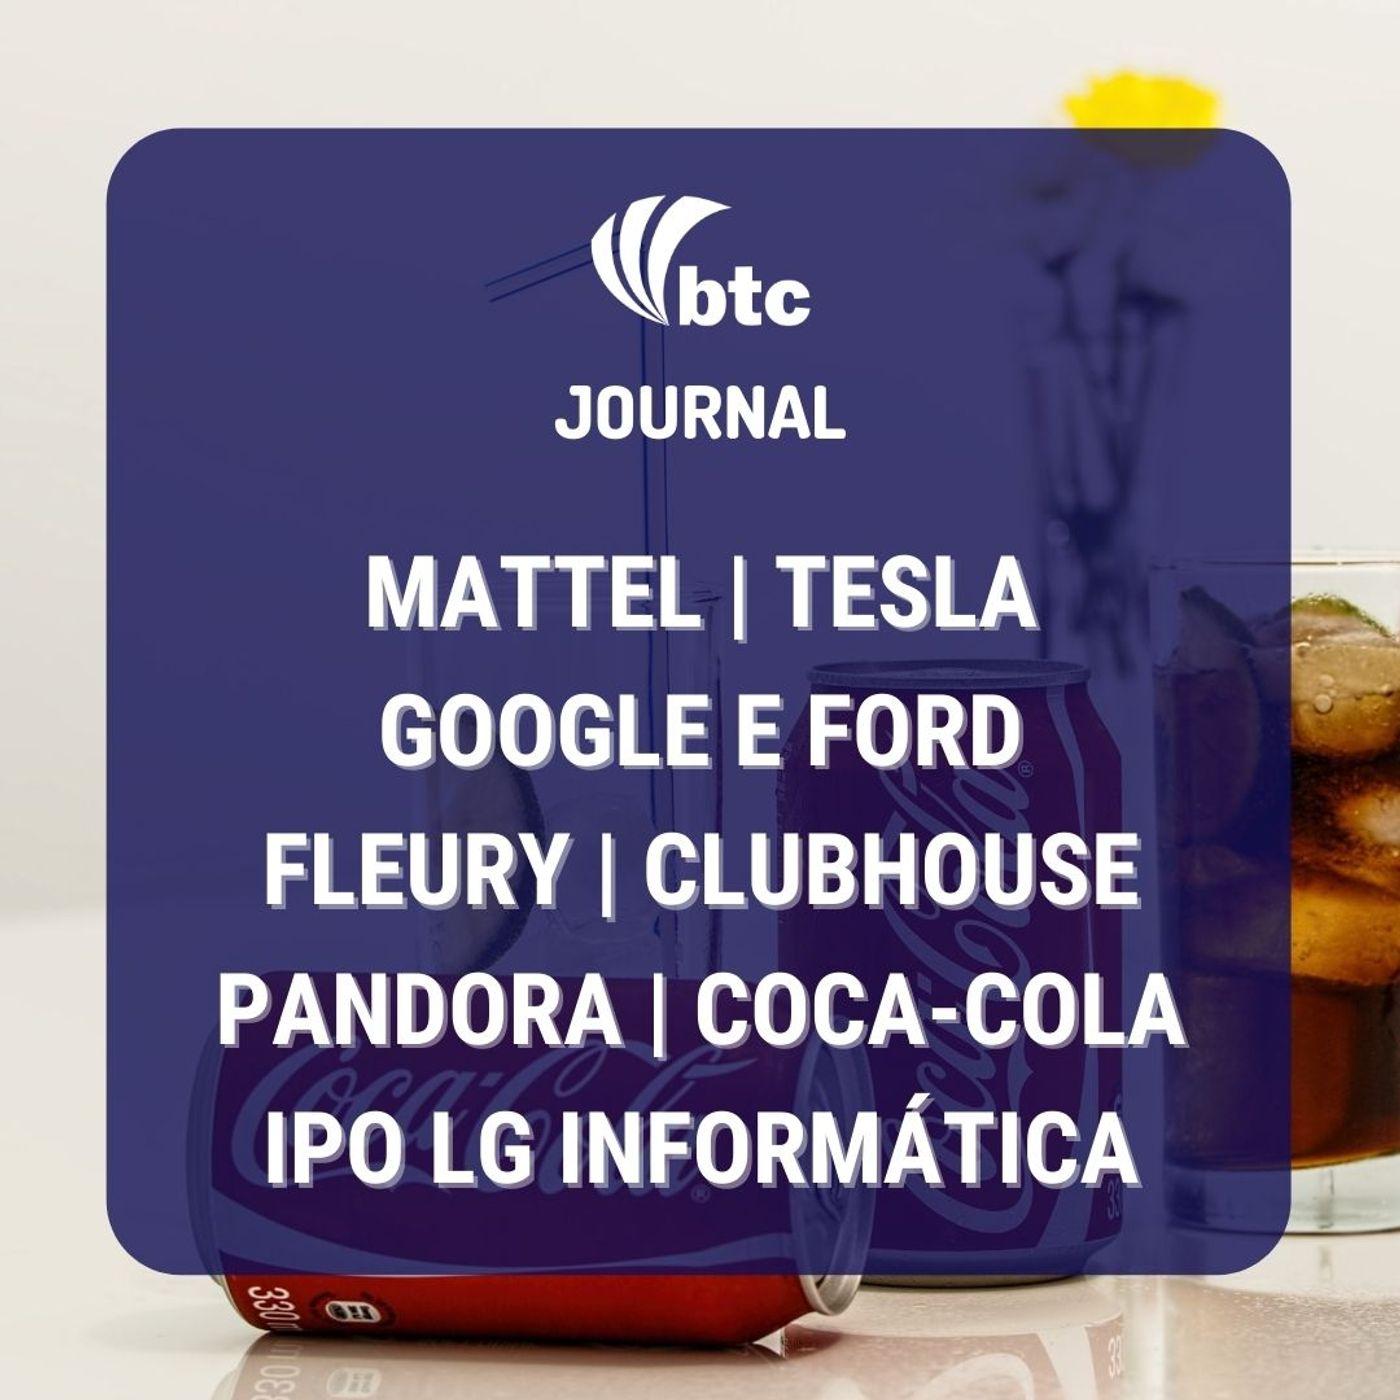 Coca-Cola, Mattel, Pandora, Clubhouse, Tesla e IPO Bemobi   BTC Journal 11/02/2021